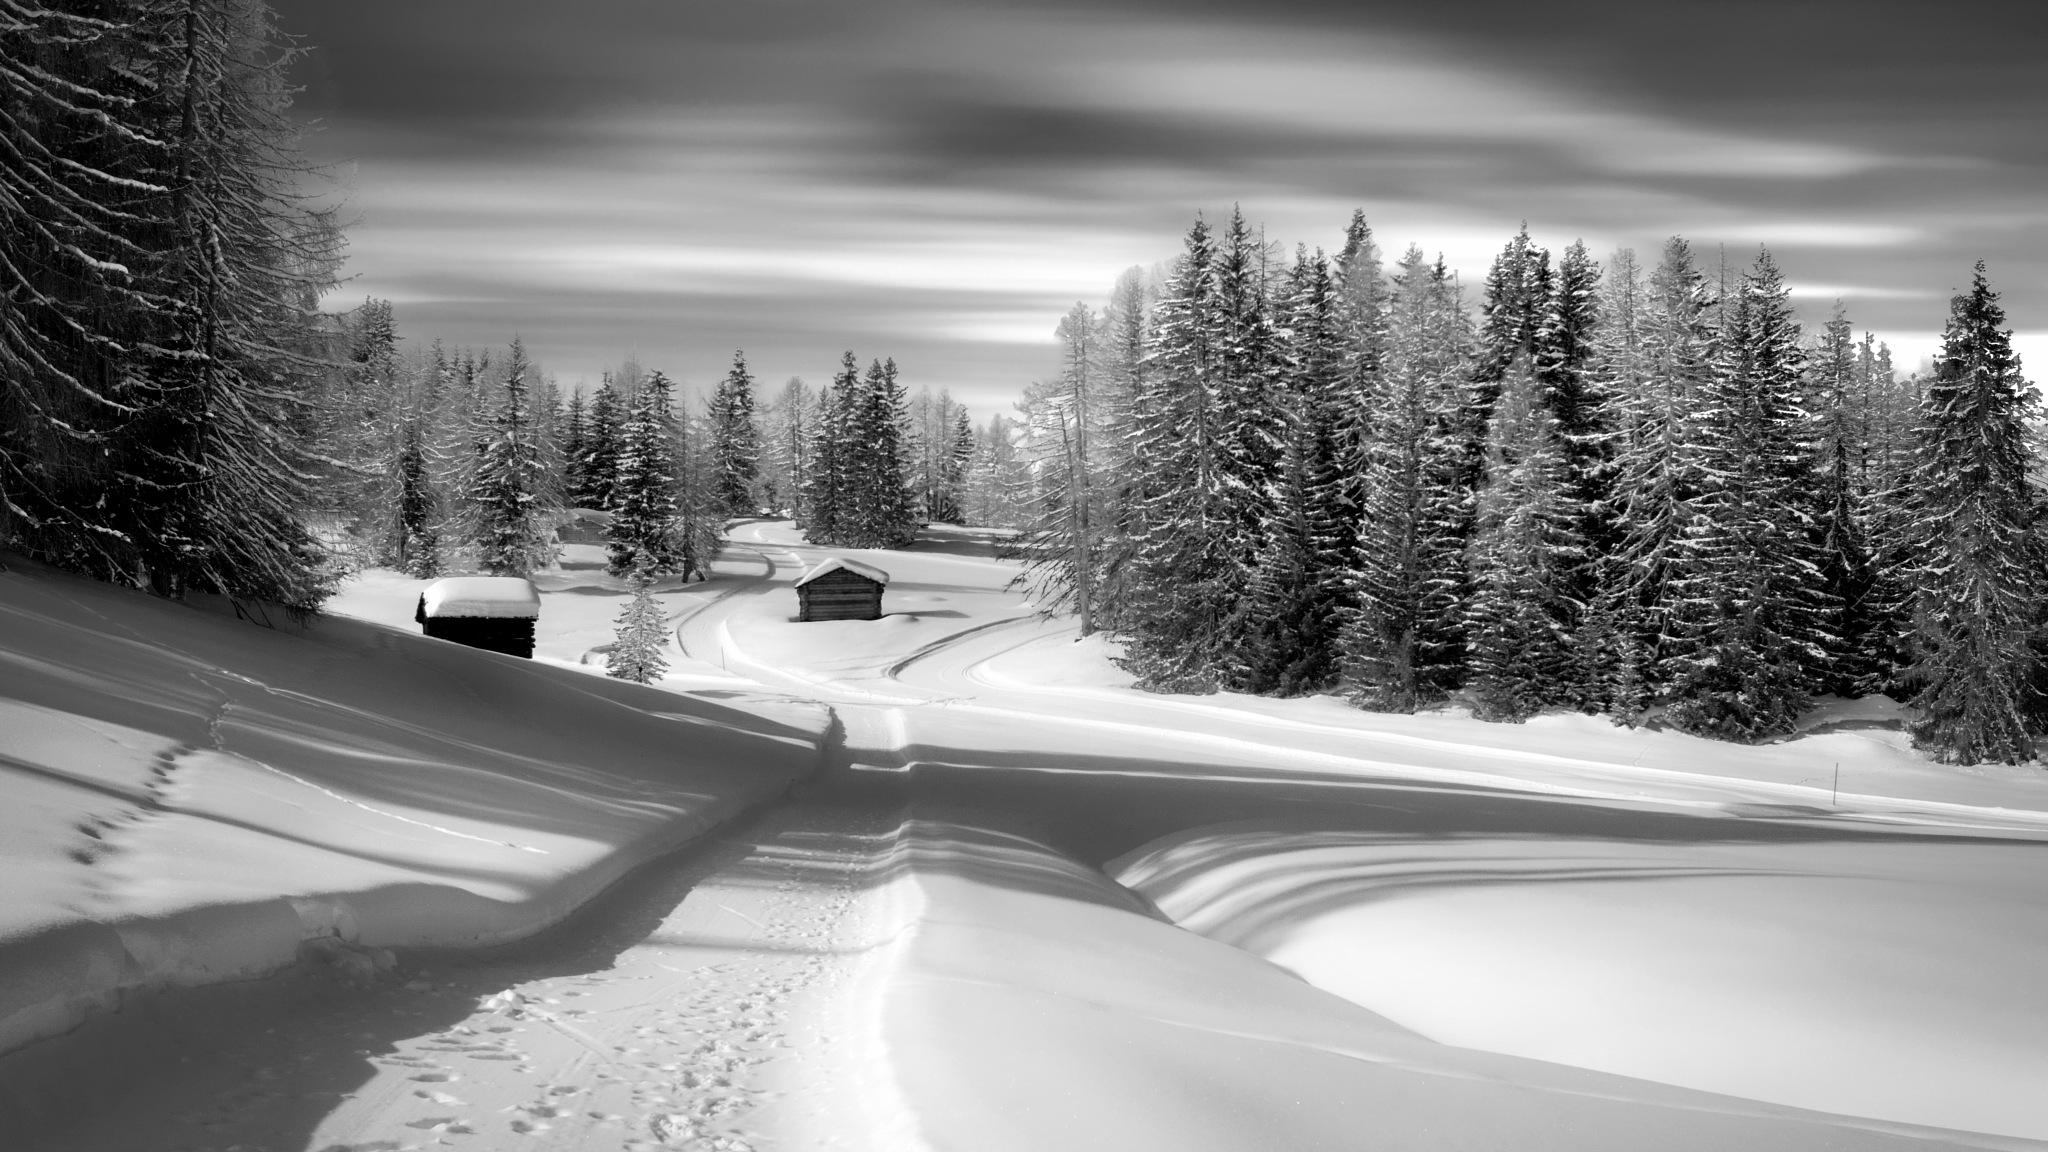 Armentara Winter Wonderland by MarkSoetebierVideophotography